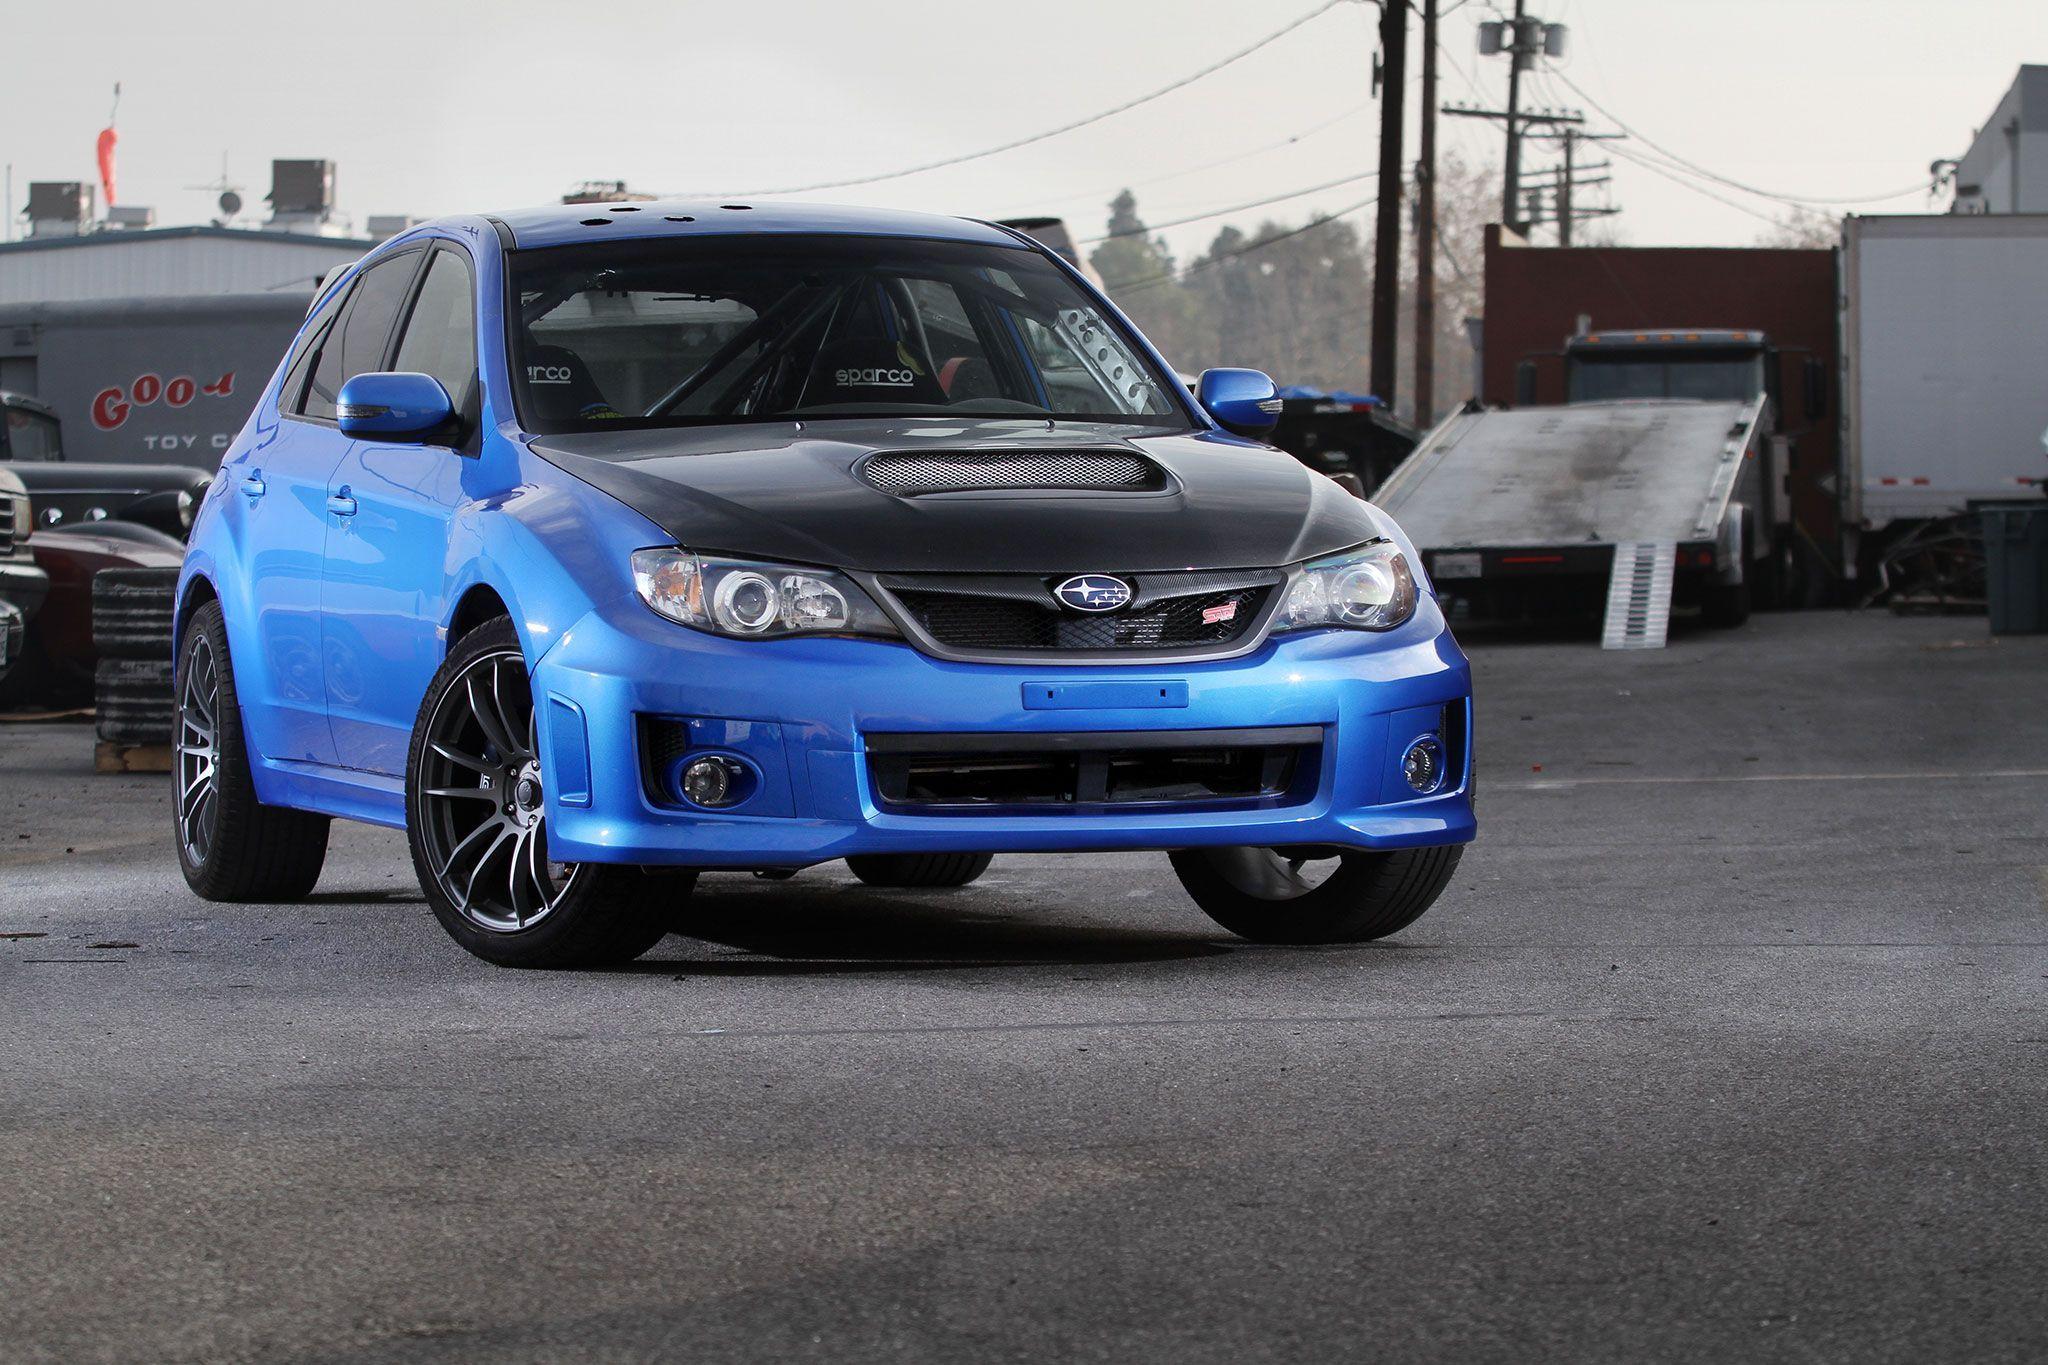 Furious 7 inside track 2014 subaru wrx sti